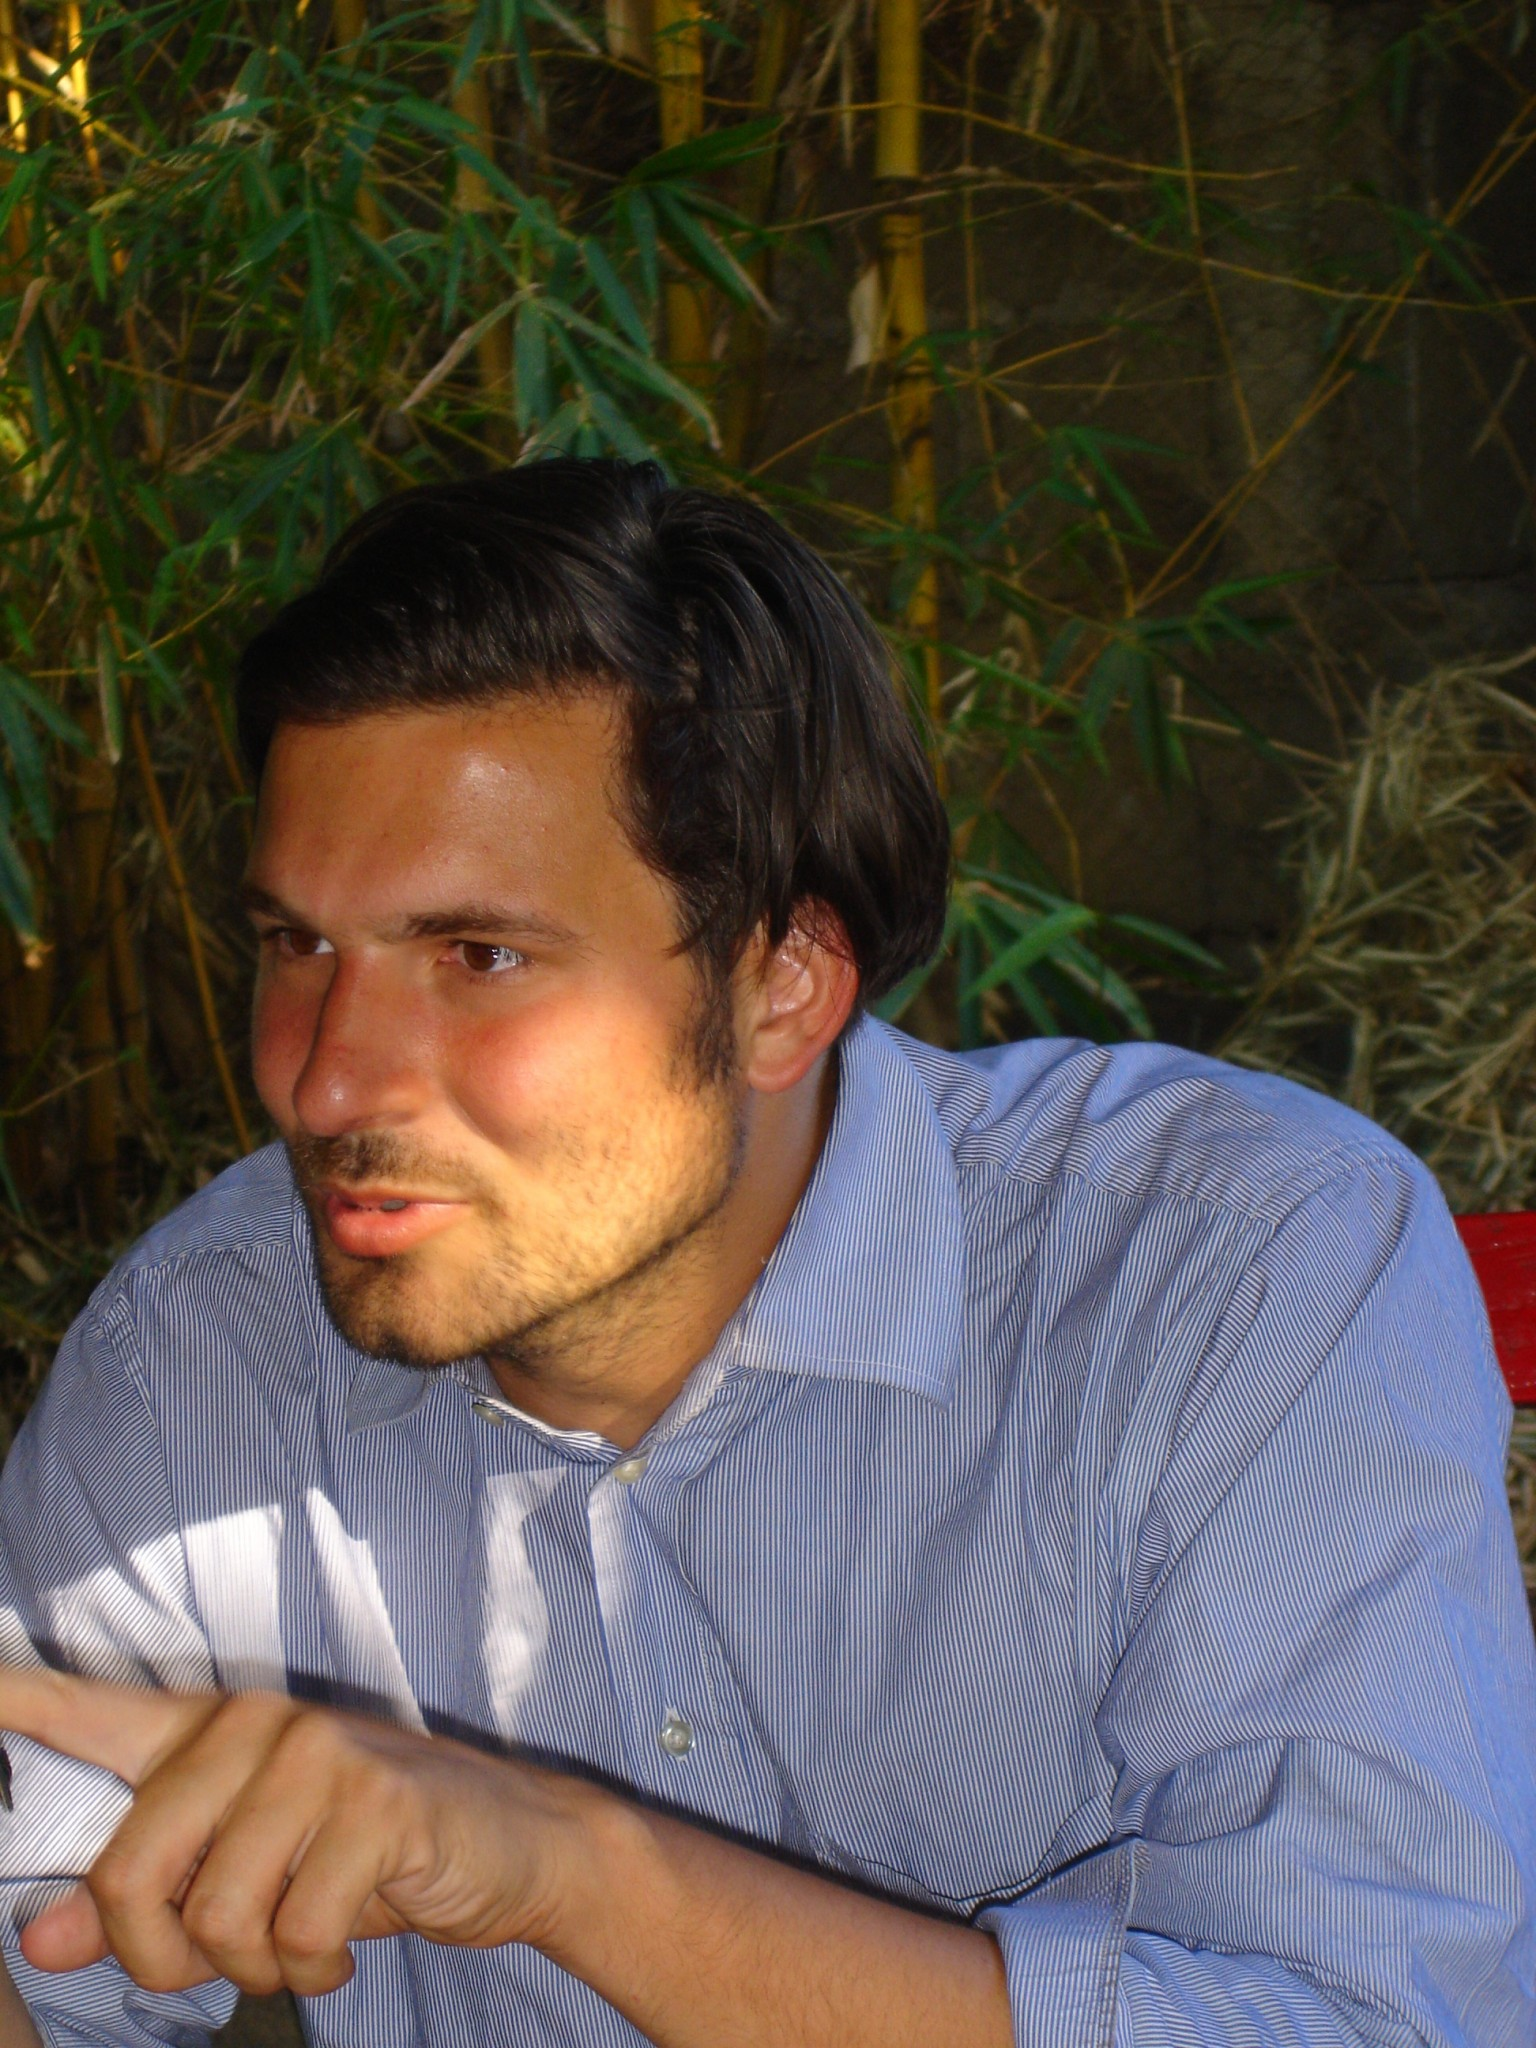 010_nicaragua_10_masaya_rs_pablo_schickinger